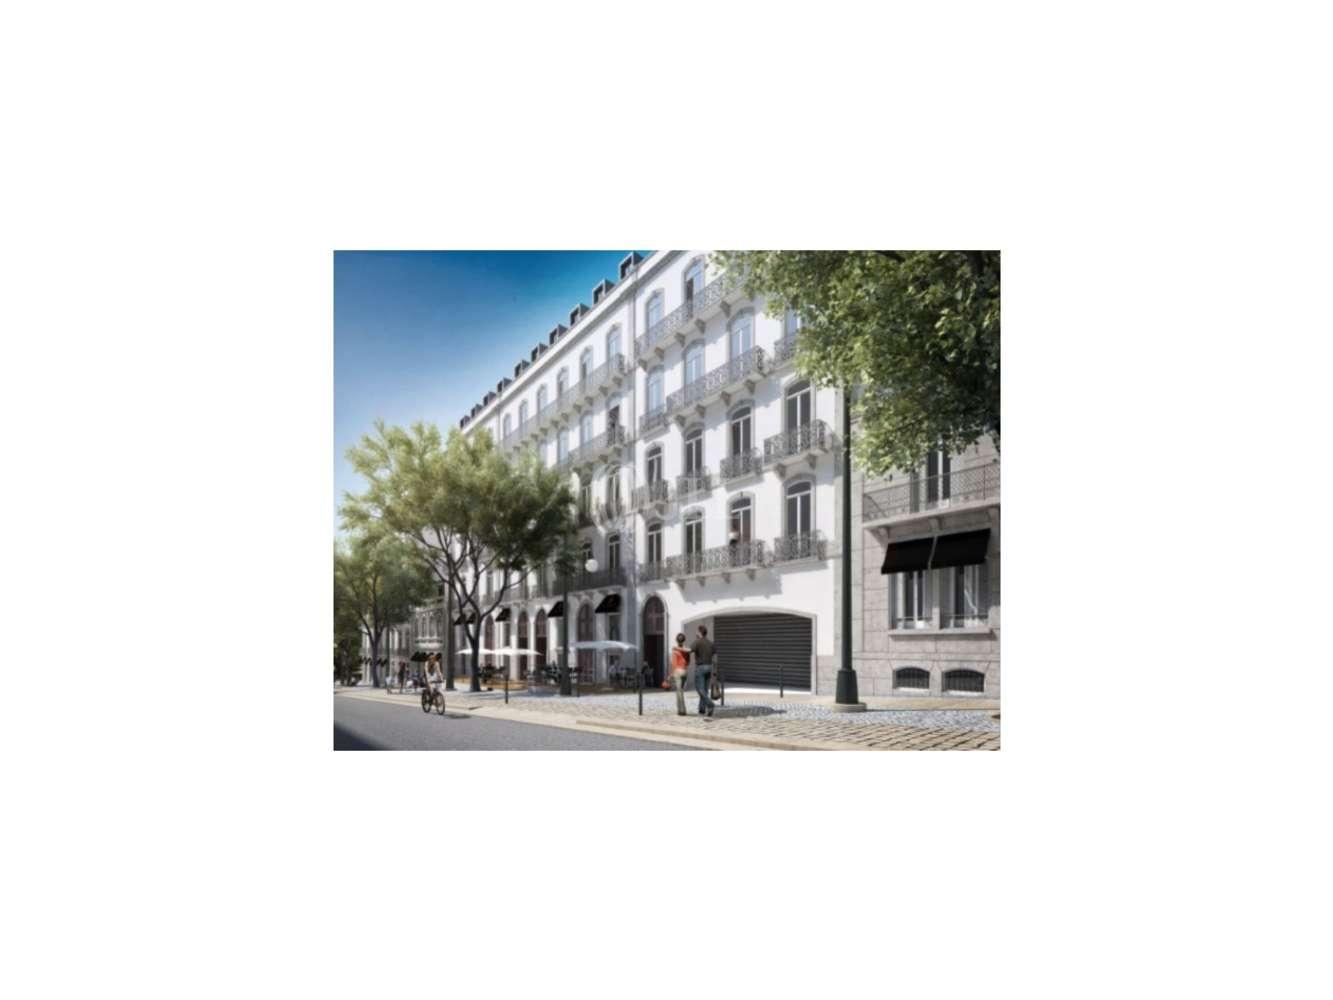 Loja Lisboa,  - Liberdade 203:  Uma referência na Avenida